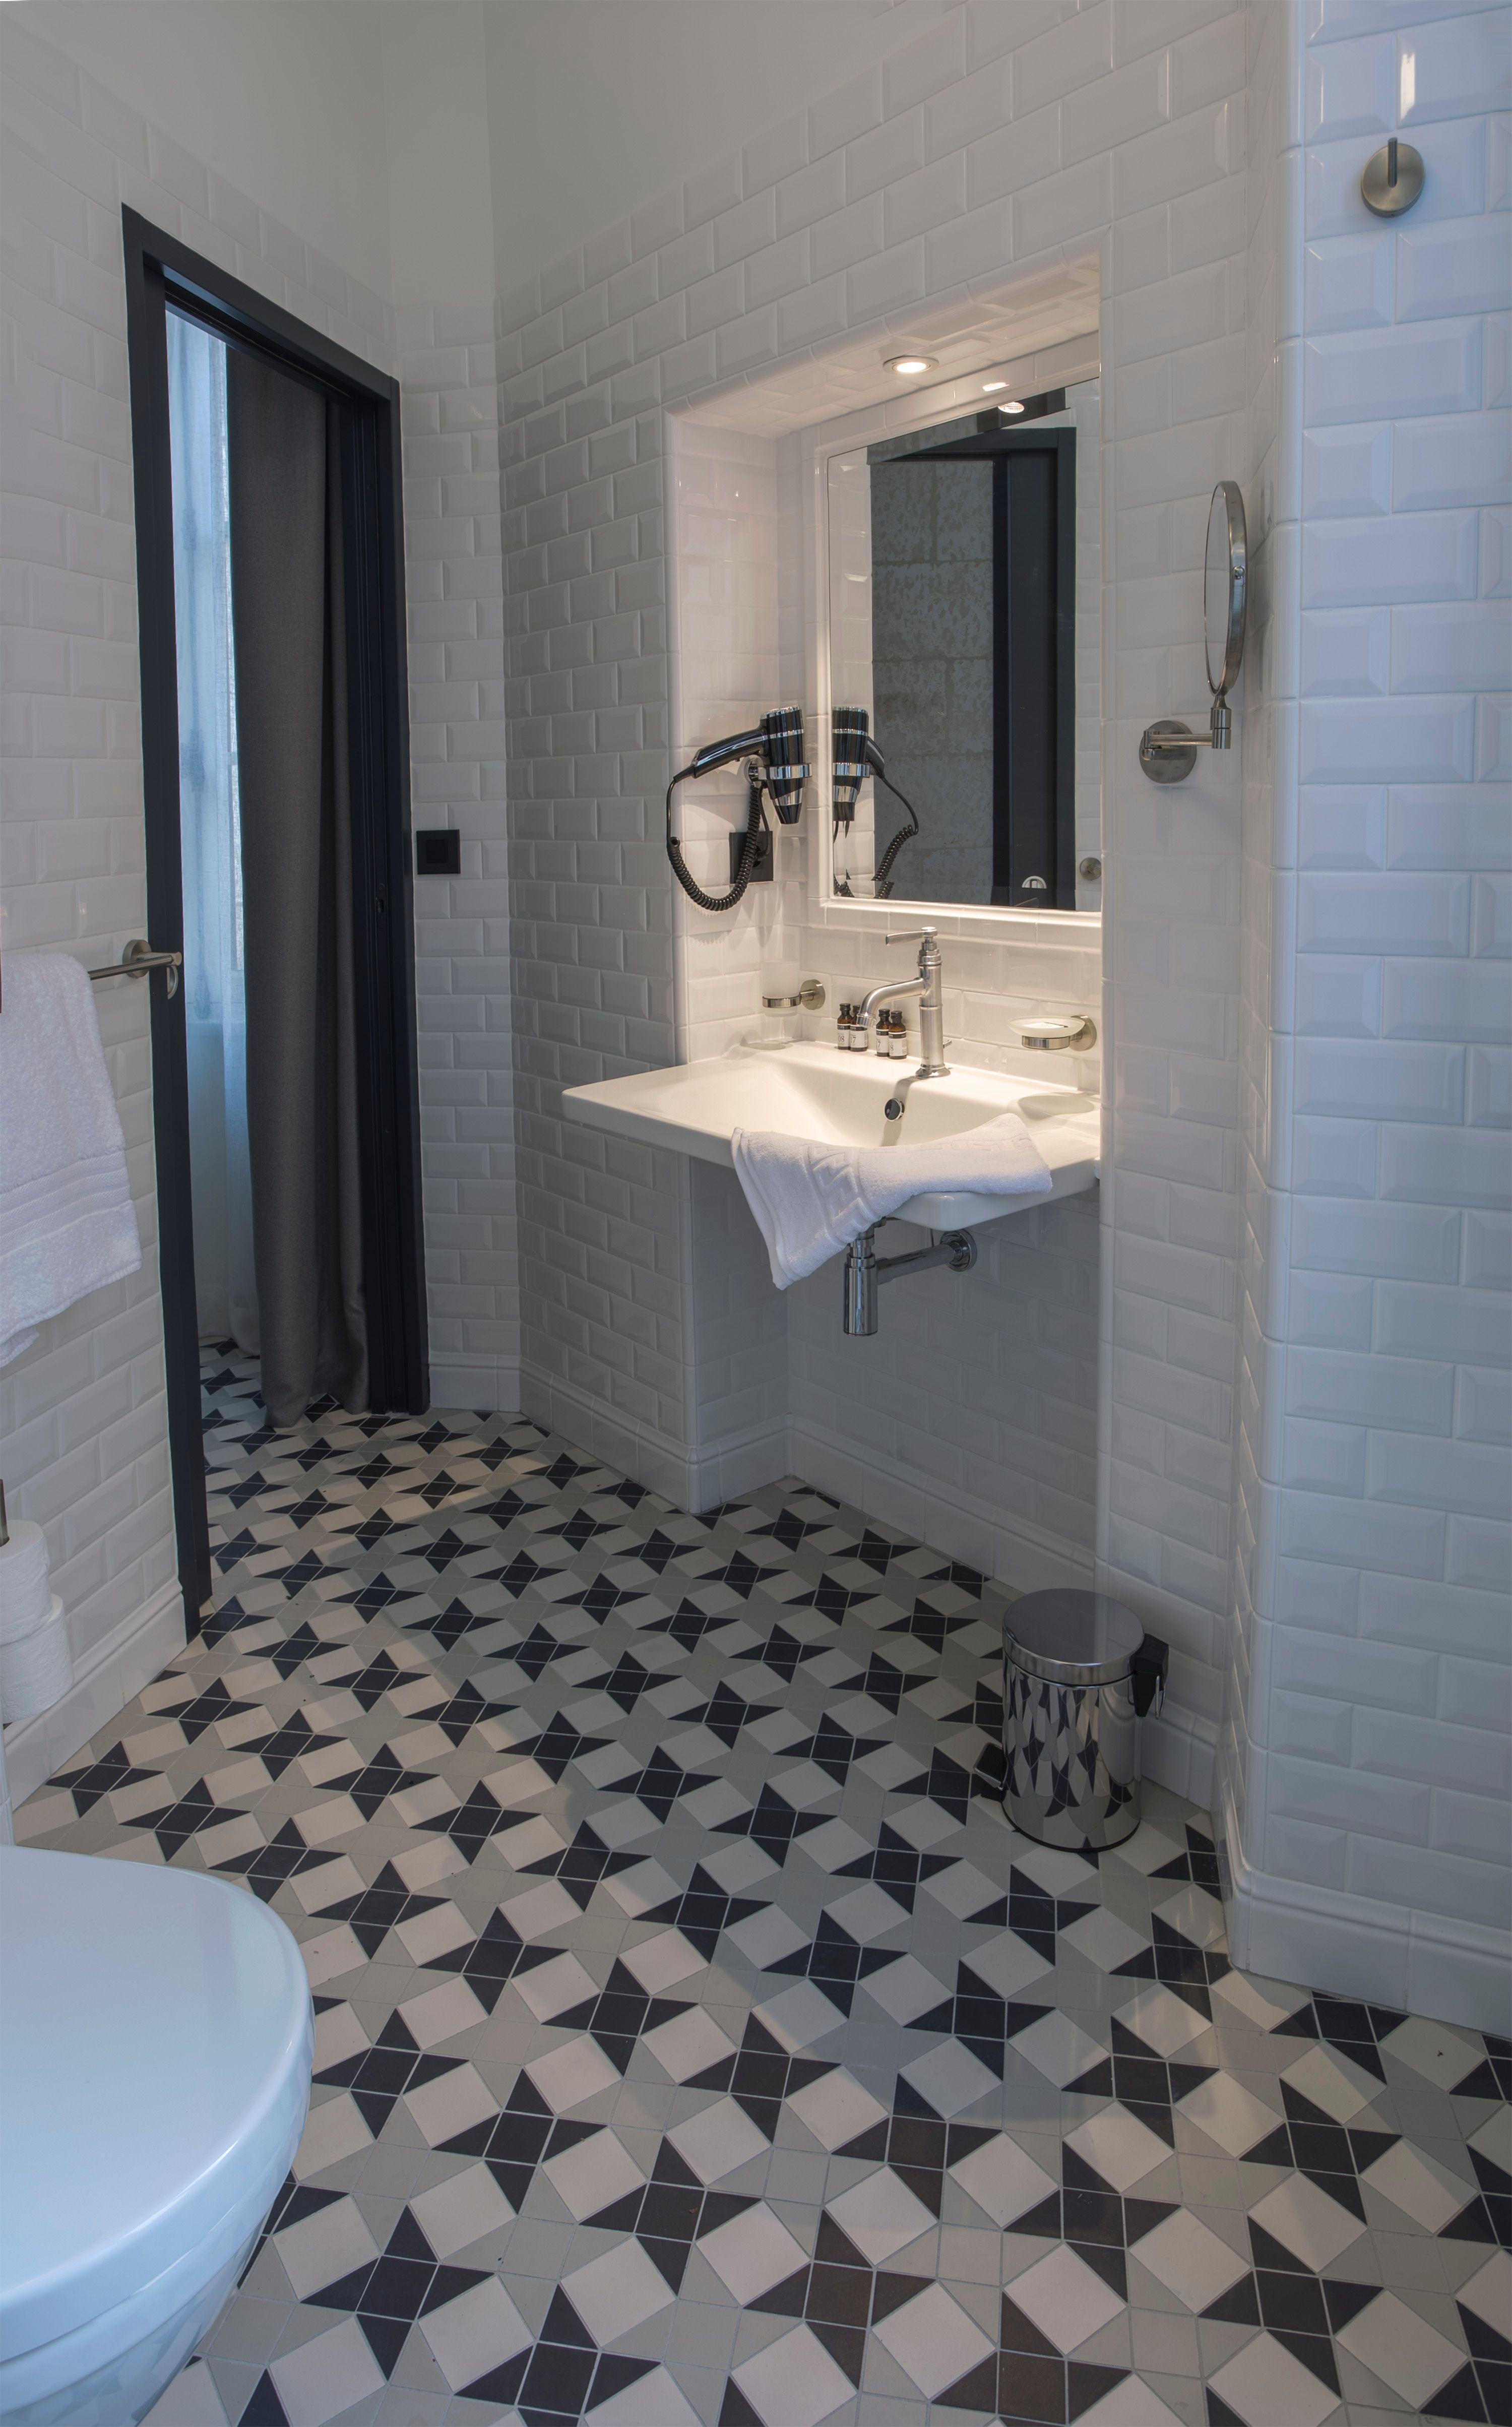 appart-hotel-angouleme-studio-paon-salle-de-bain